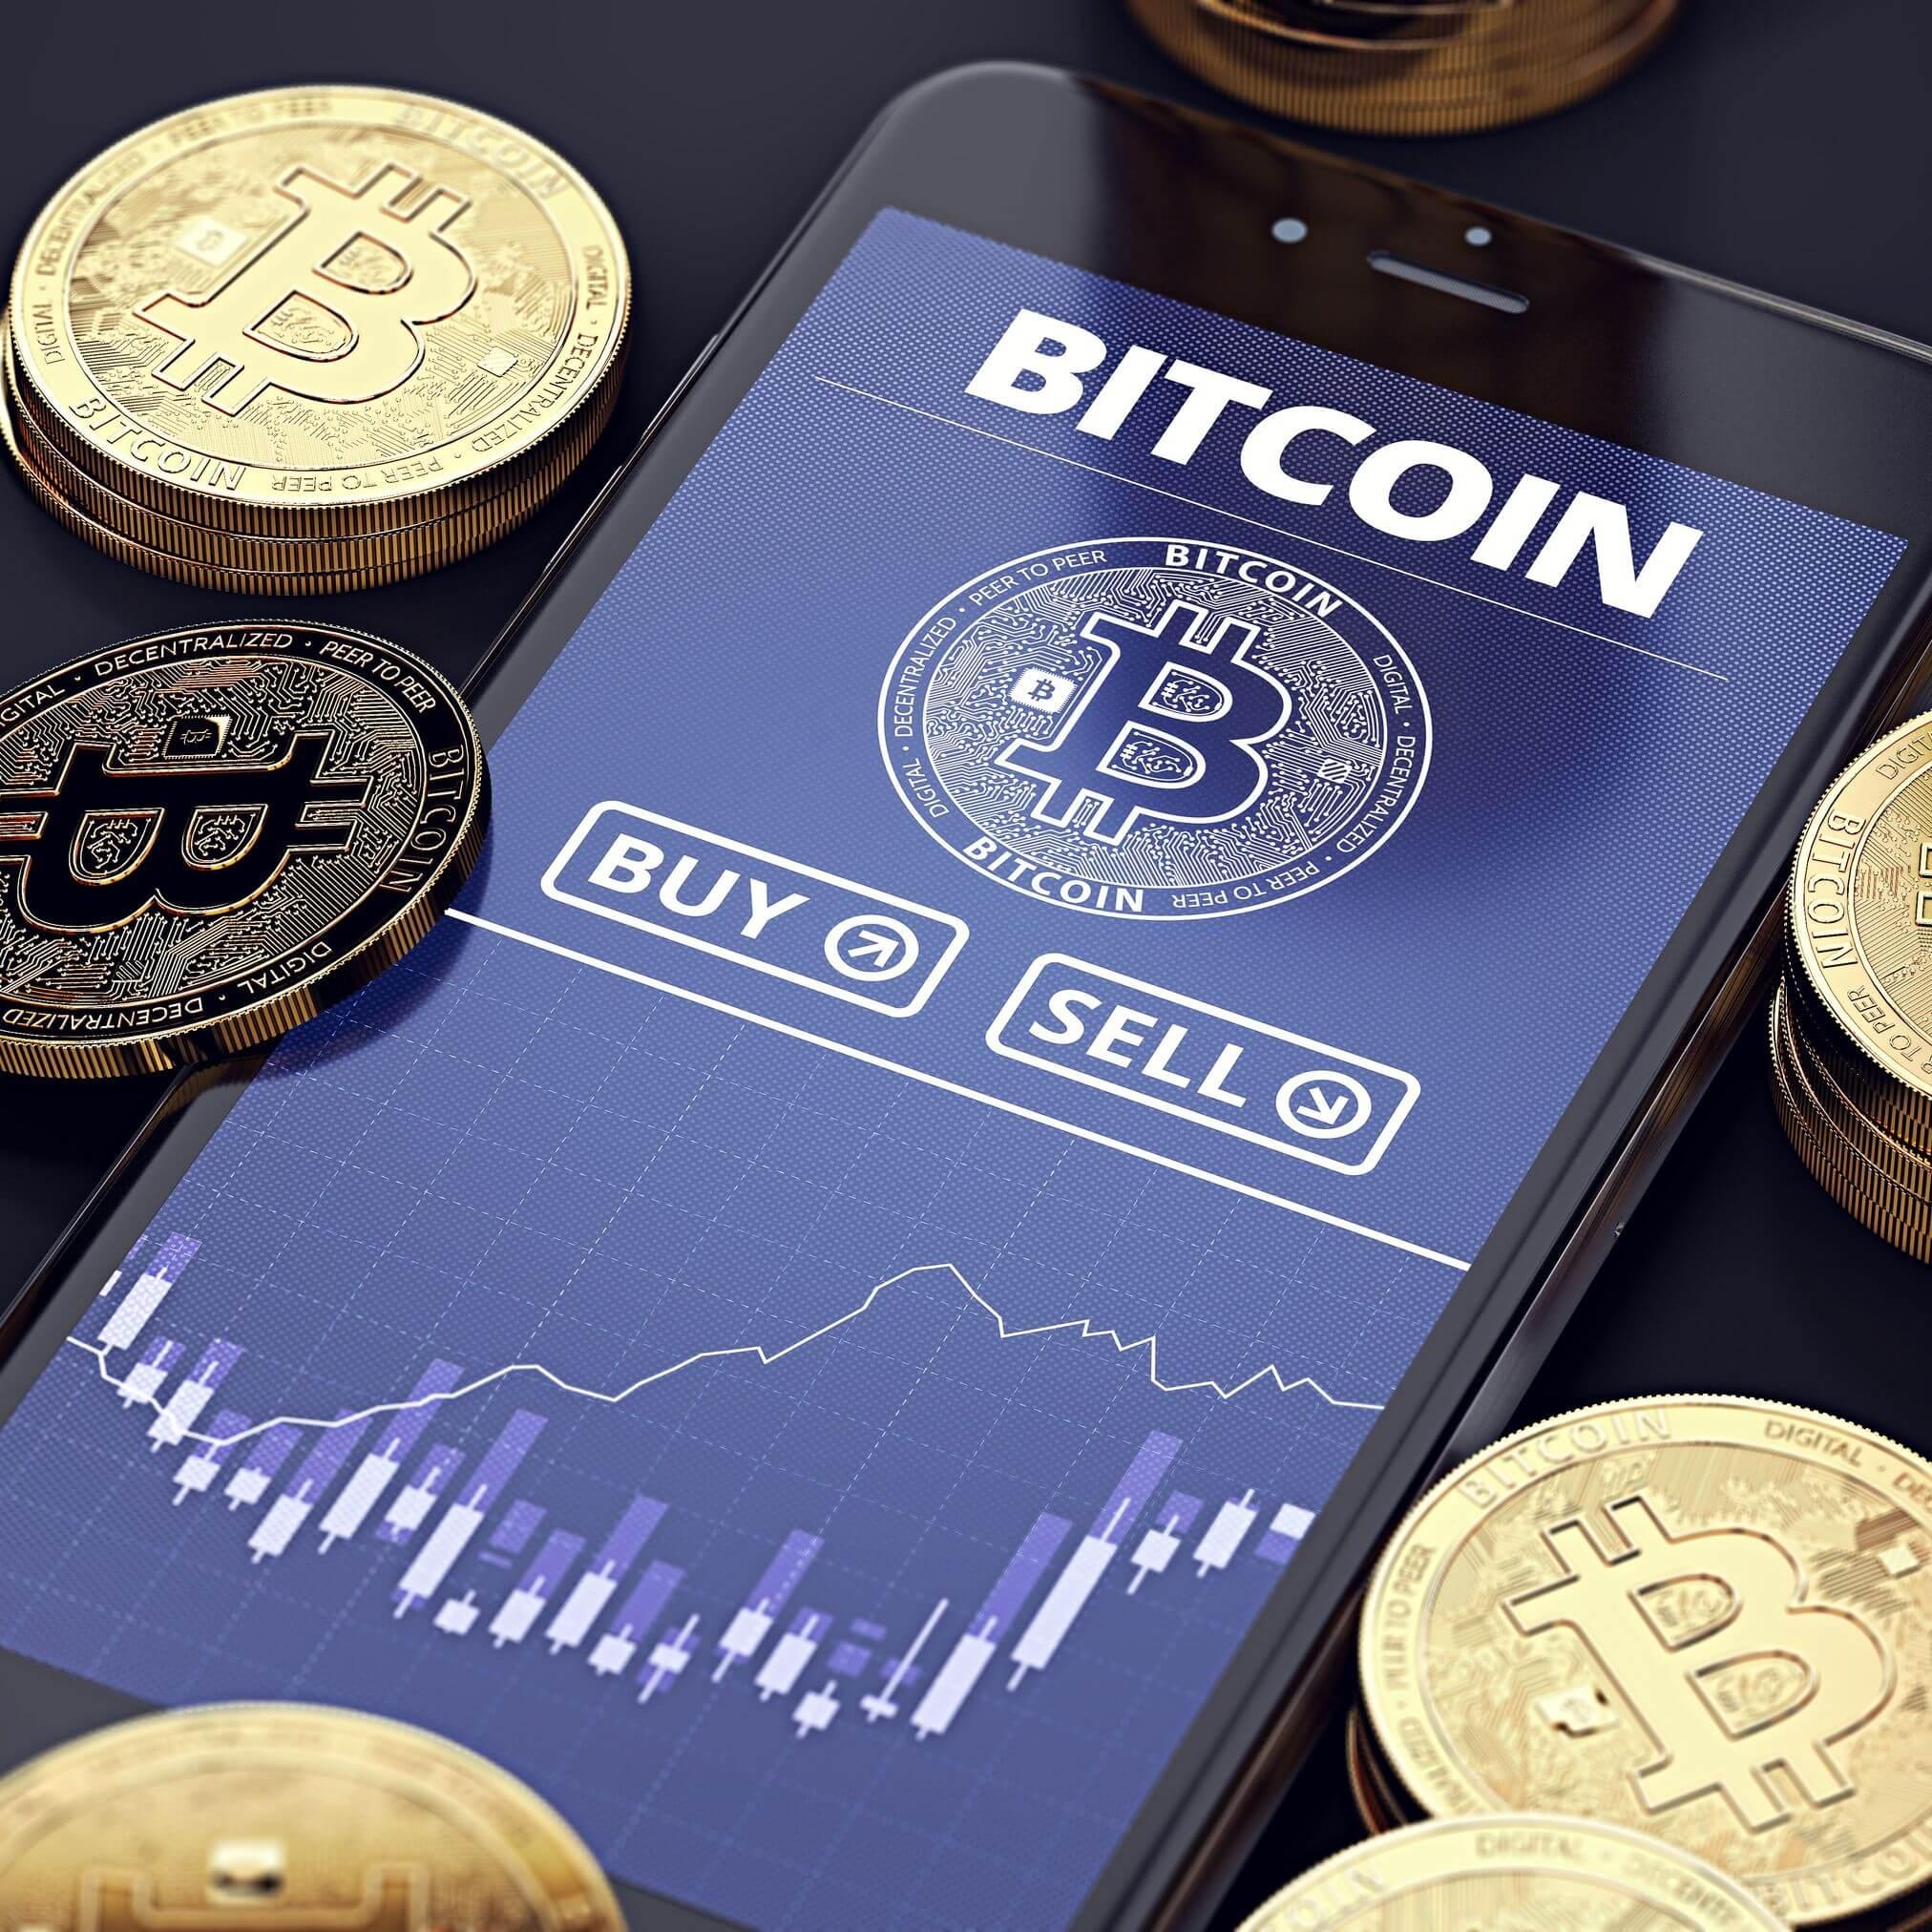 Bitcoin Rush Official Website 🥇 | blogger.com™